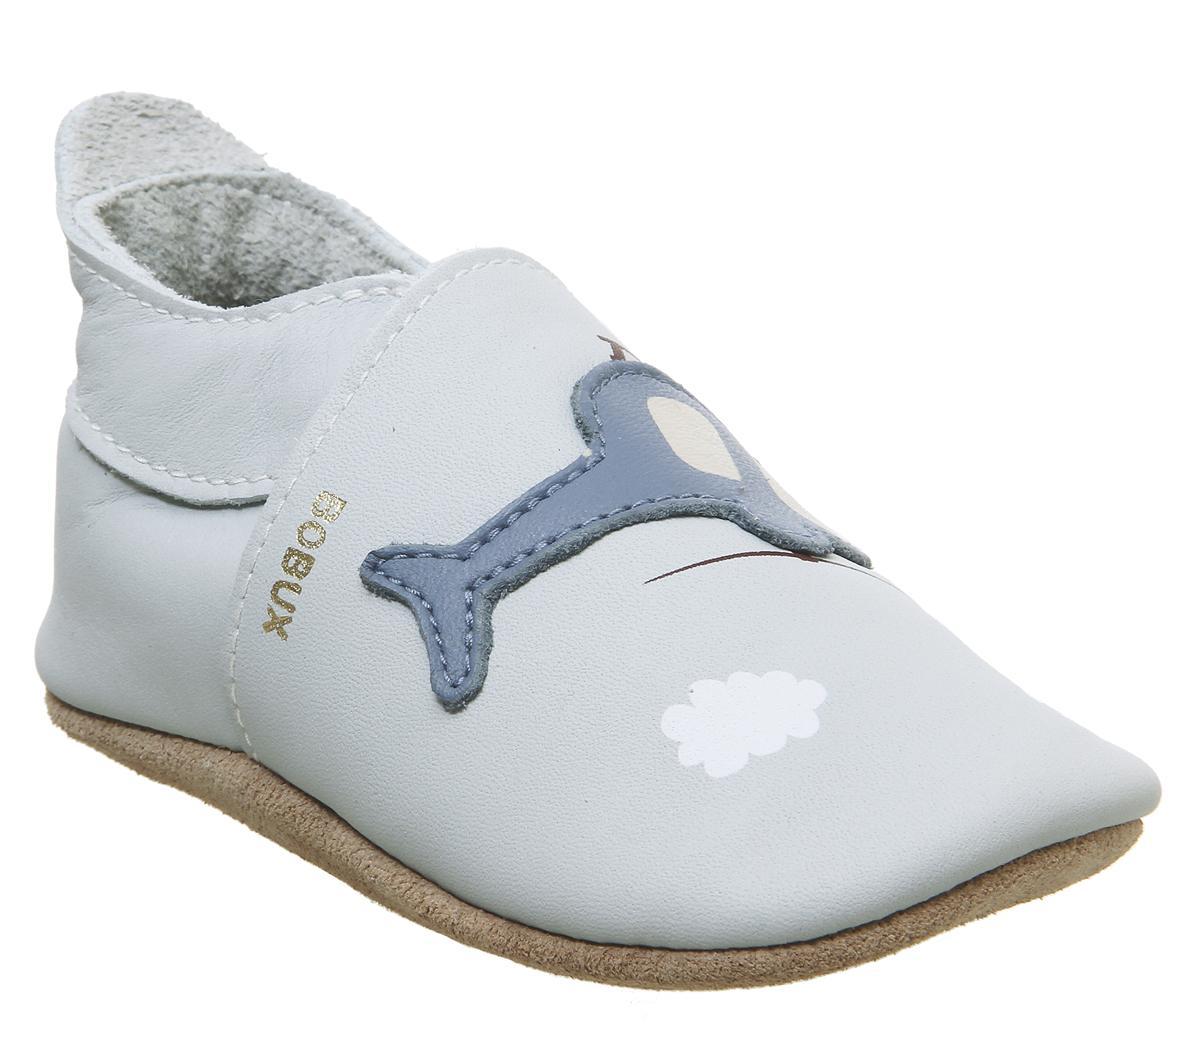 Bobux Soft Sole Crib Shoes Sky